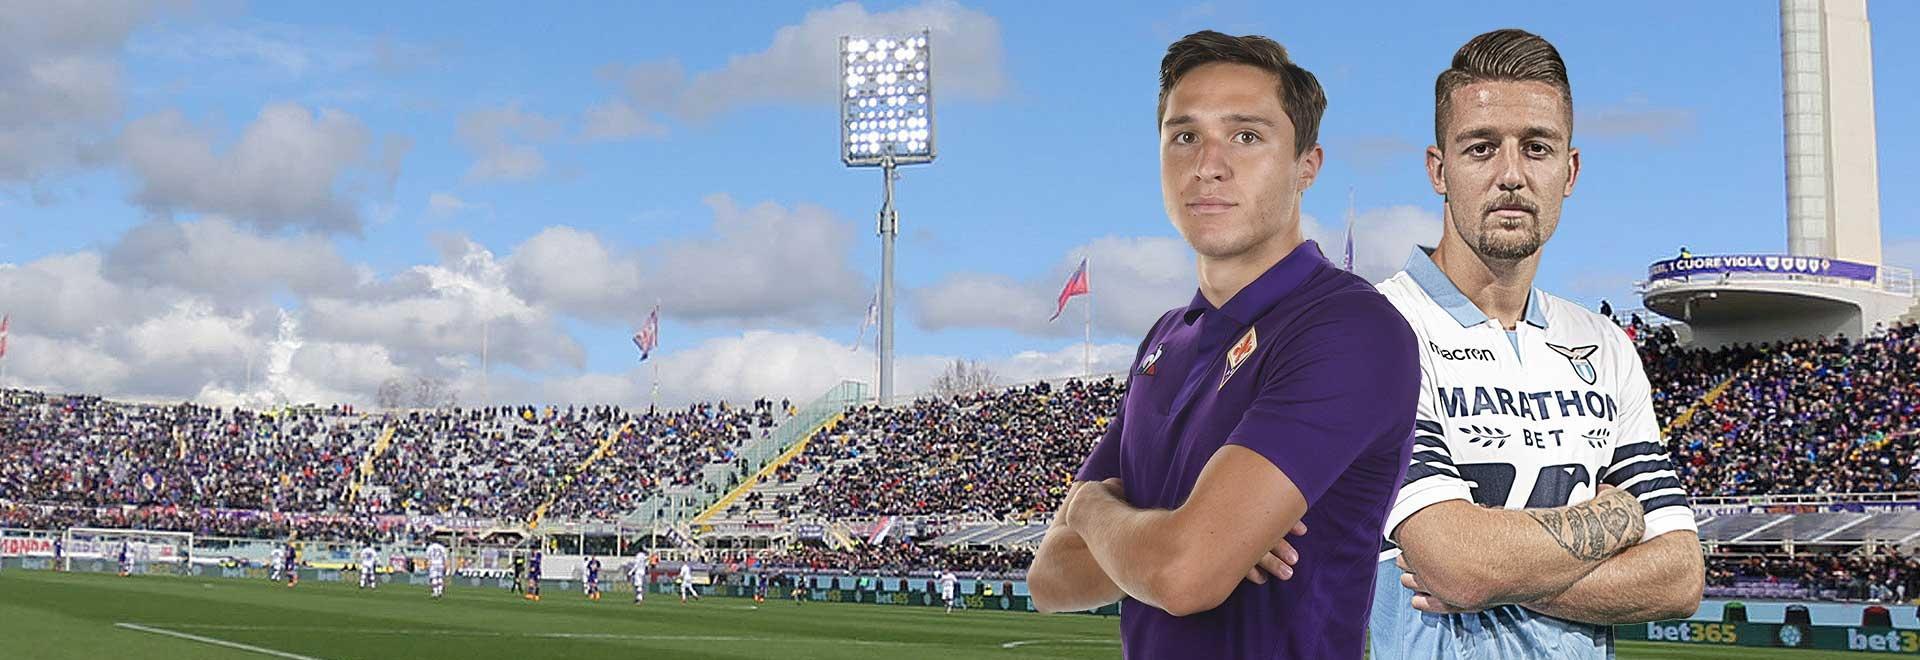 Fiorentina - Lazio